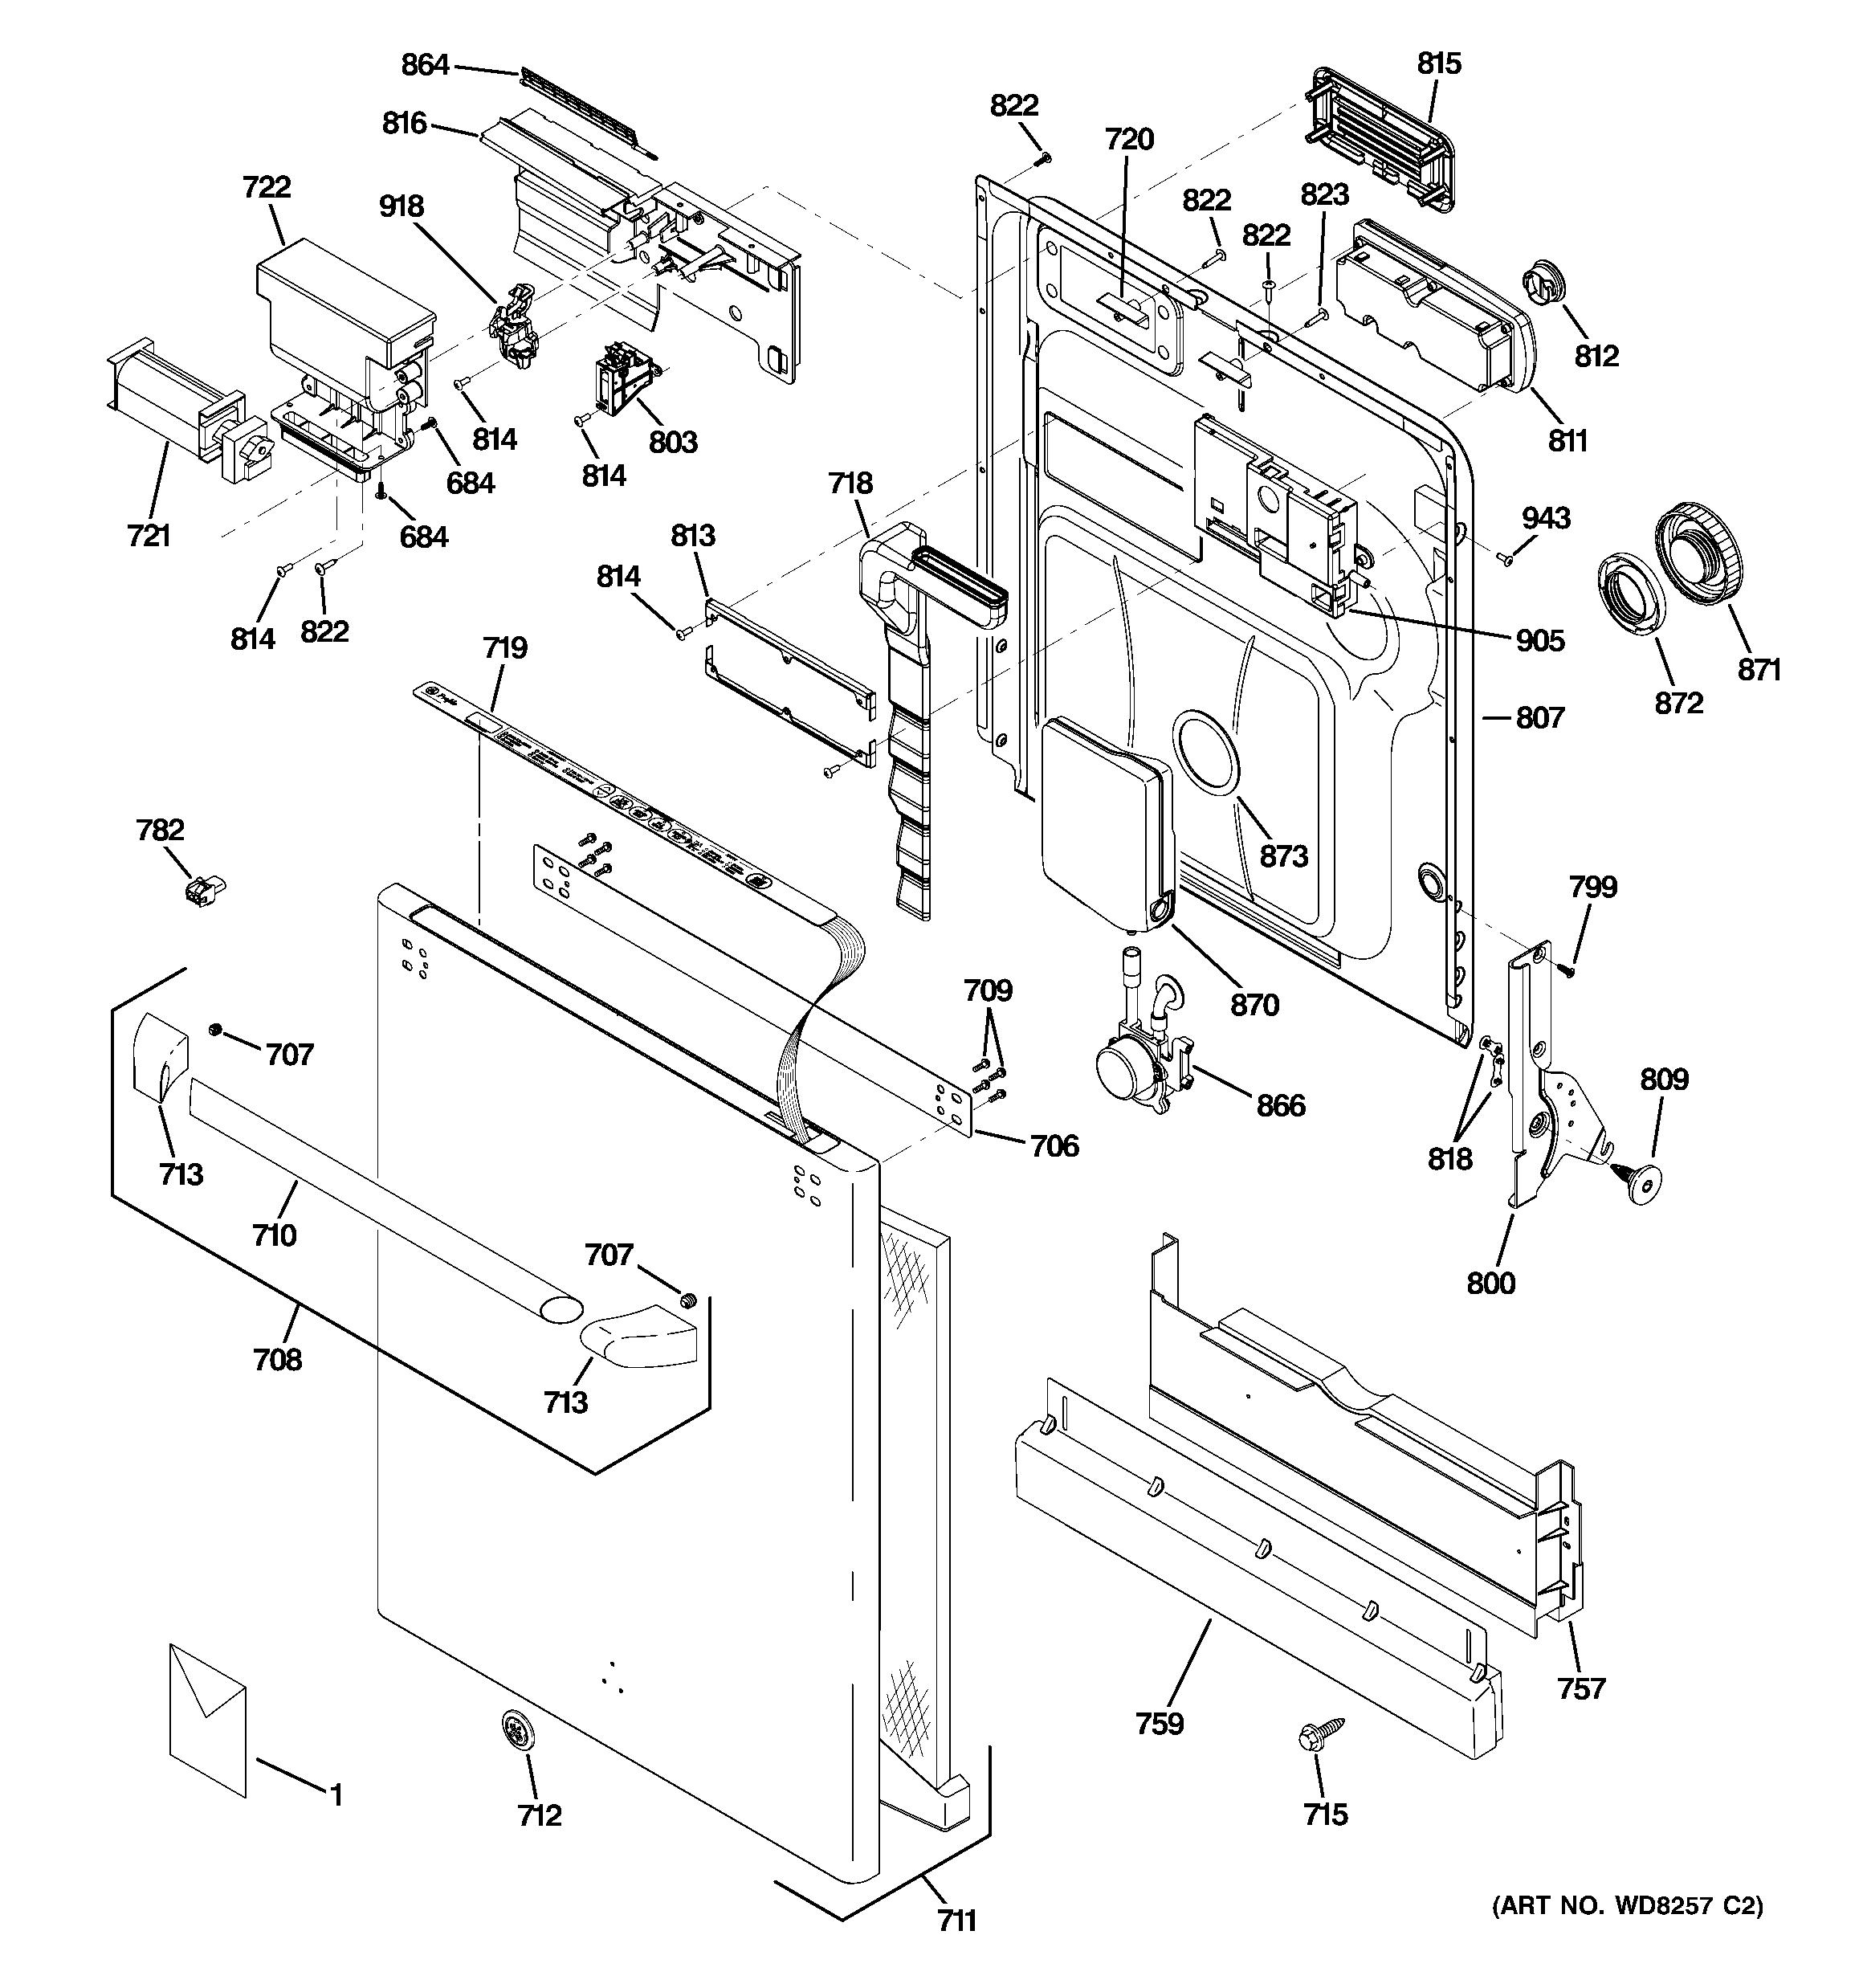 ge profile range wiring diagram ge schematic diagrams wiring diagram data  ge schematic diagrams wiring diagram data